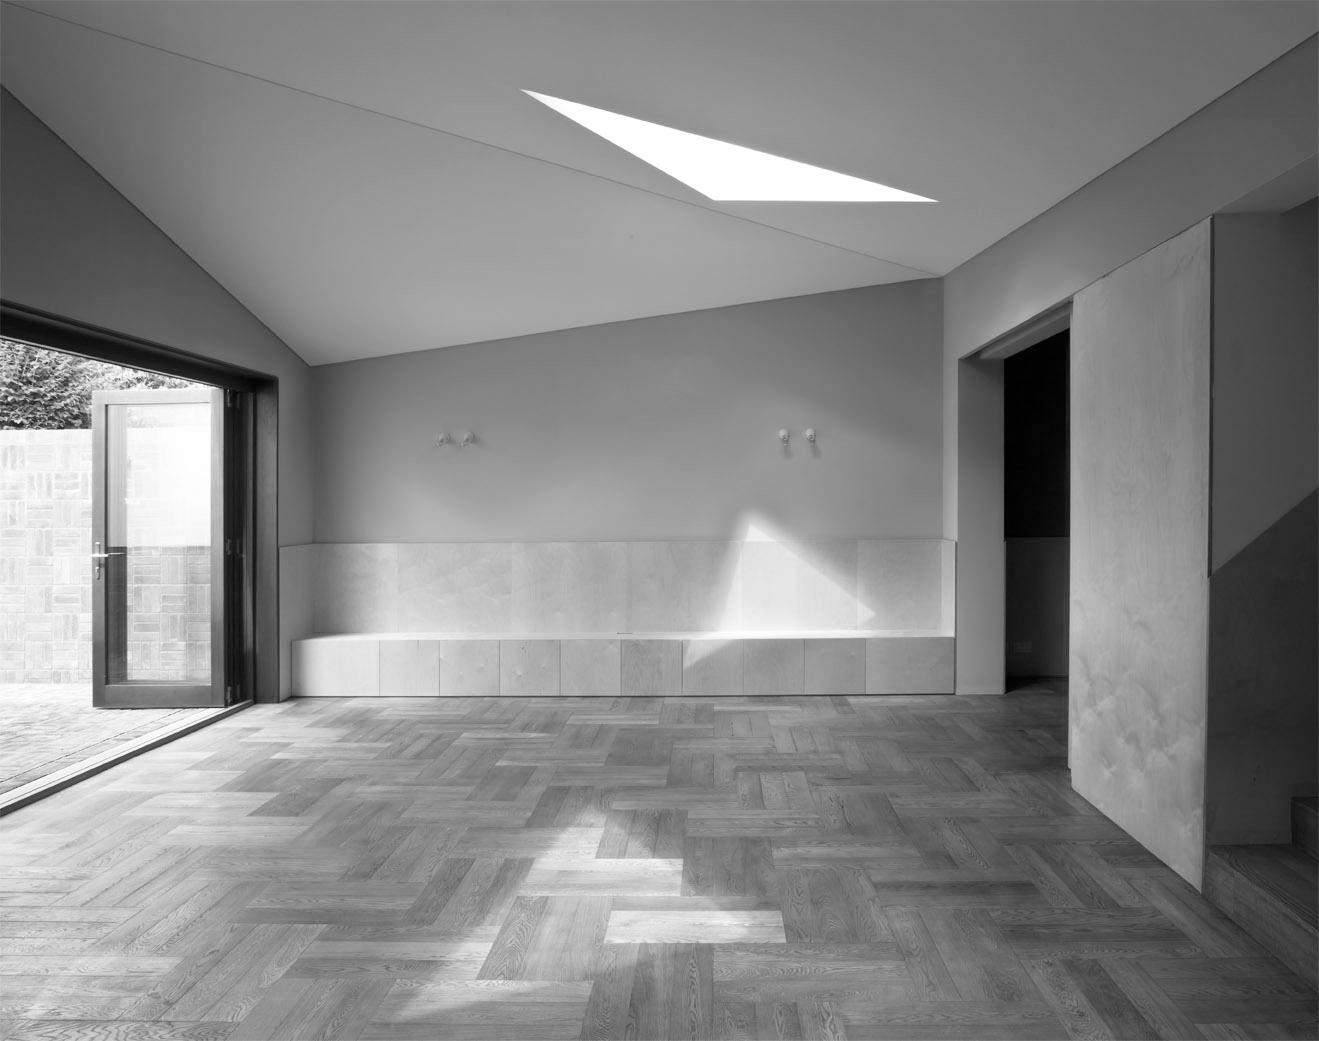 MOCT_house_extension_barnham rd_bw_image01.jpg